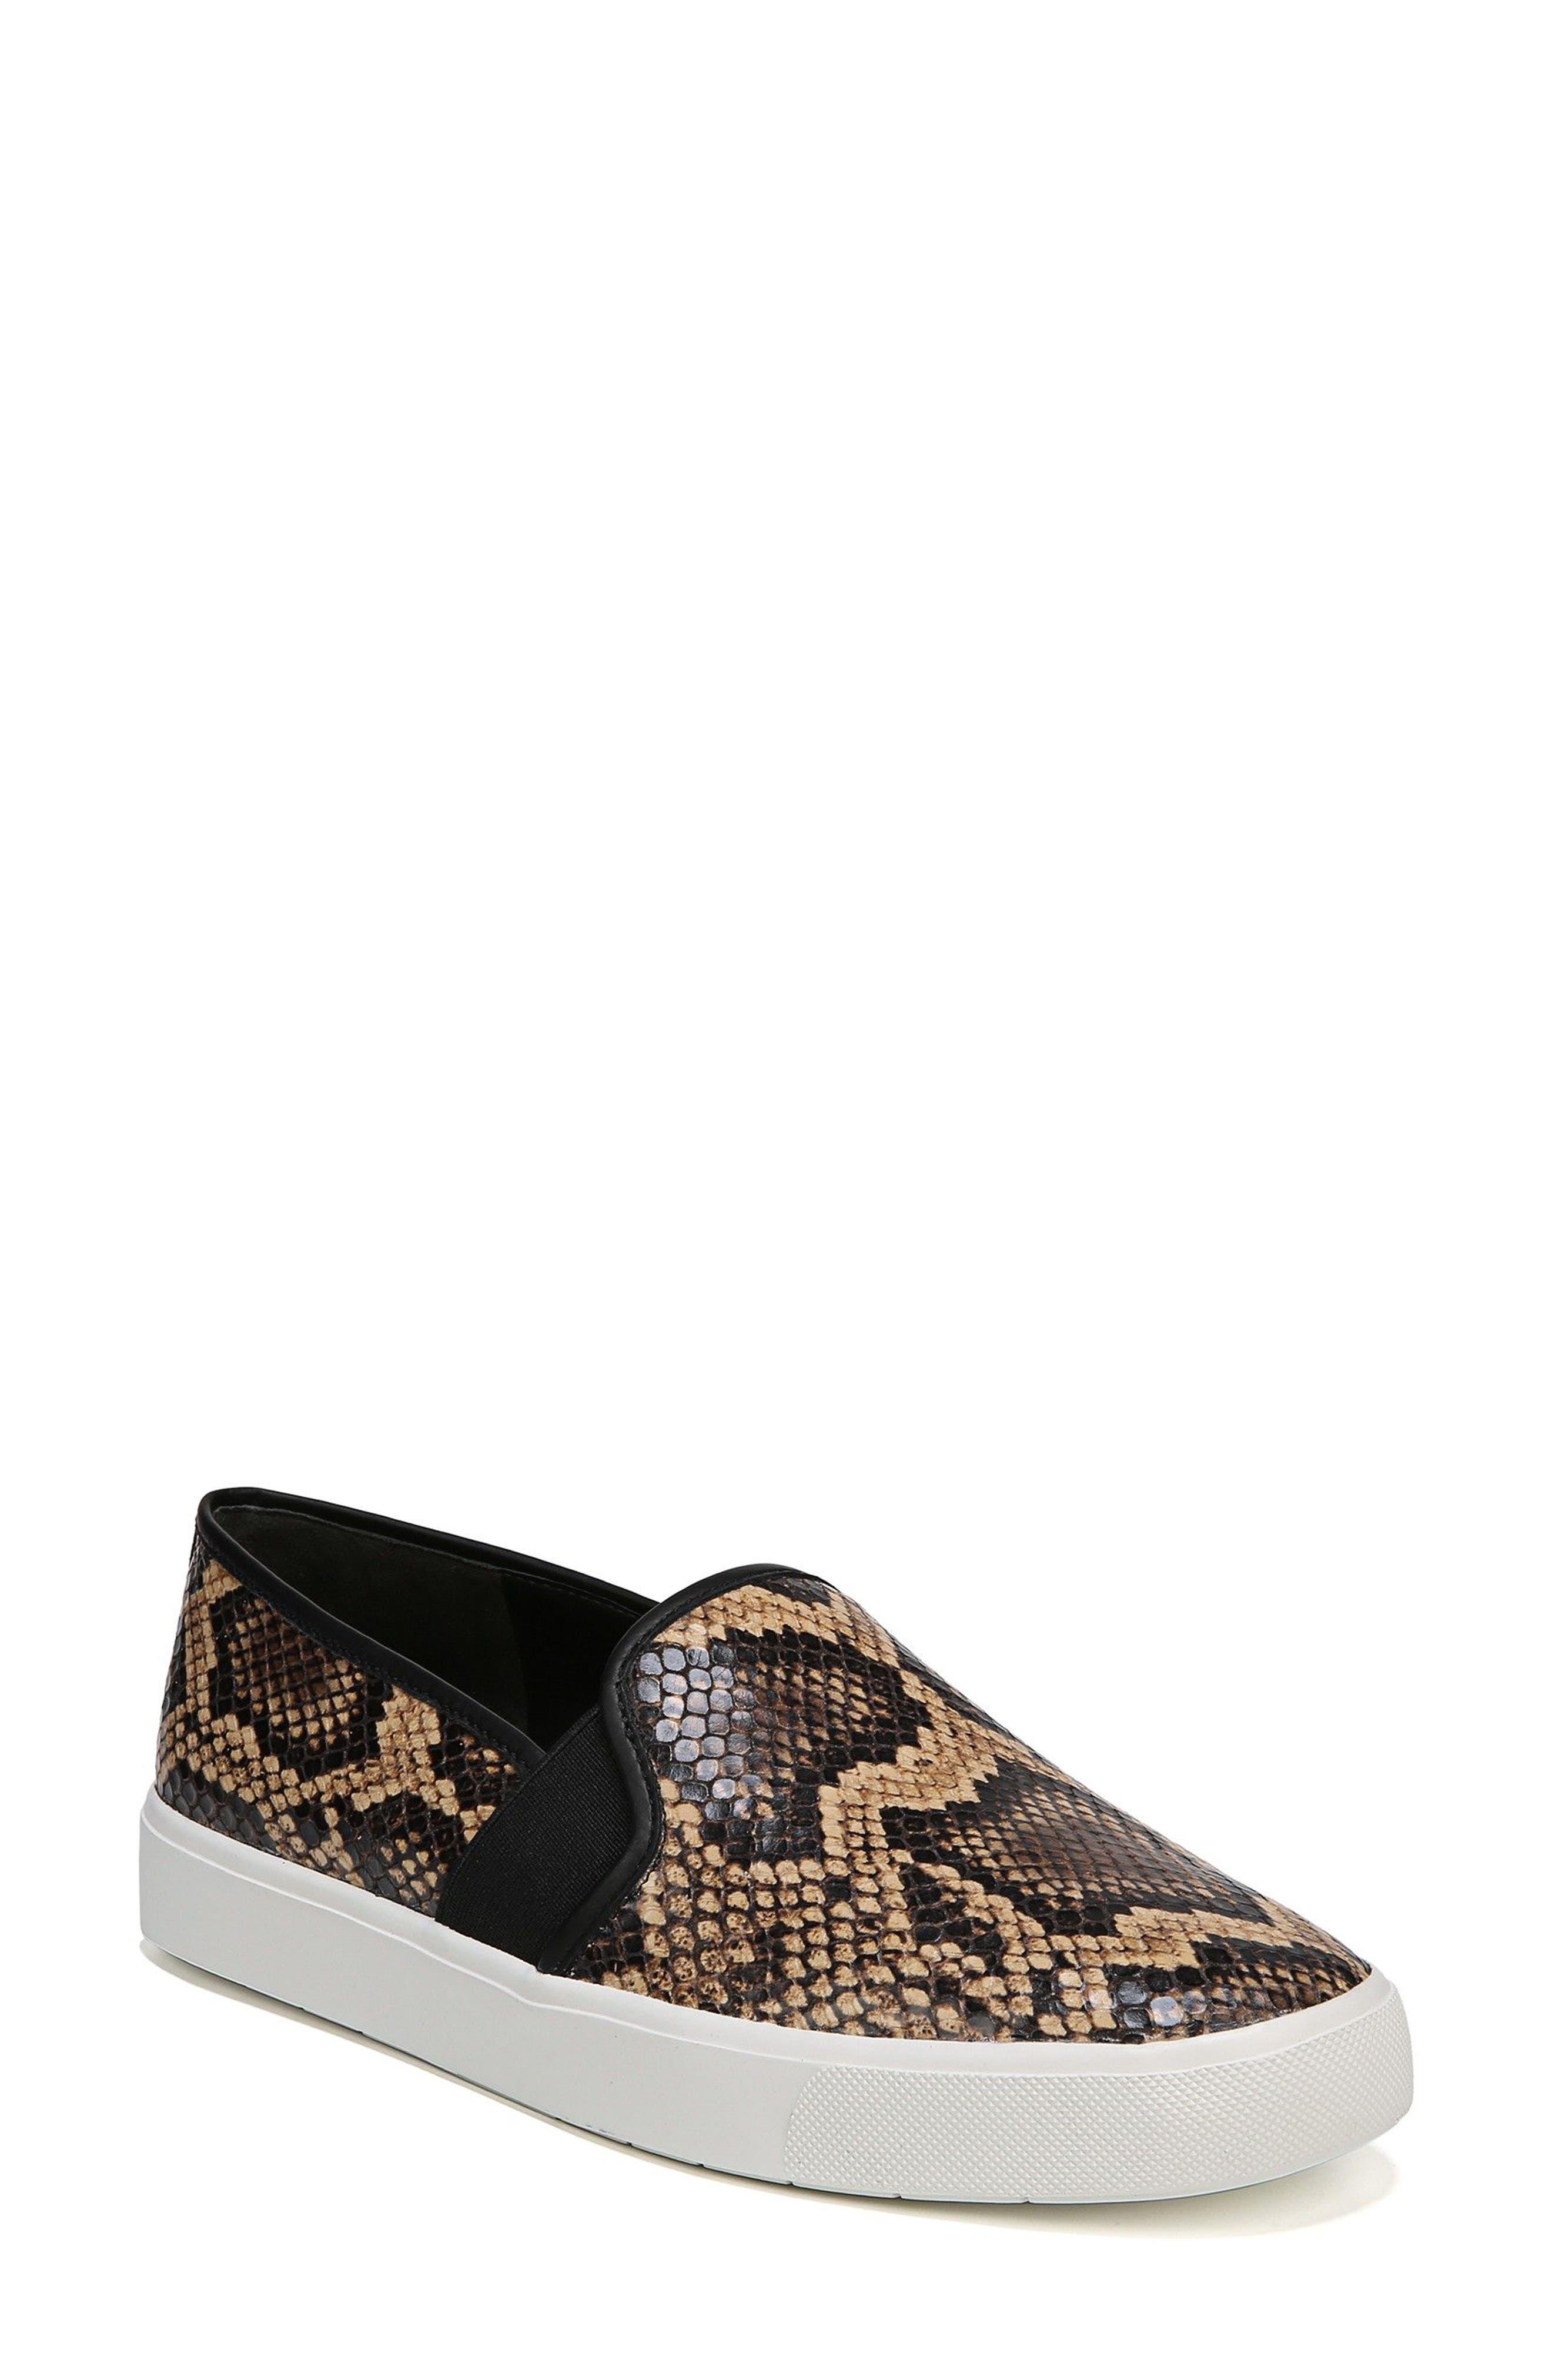 Blair 5 Slip-On Sneaker,                             Main thumbnail 1, color,                             Senegal Snake Print